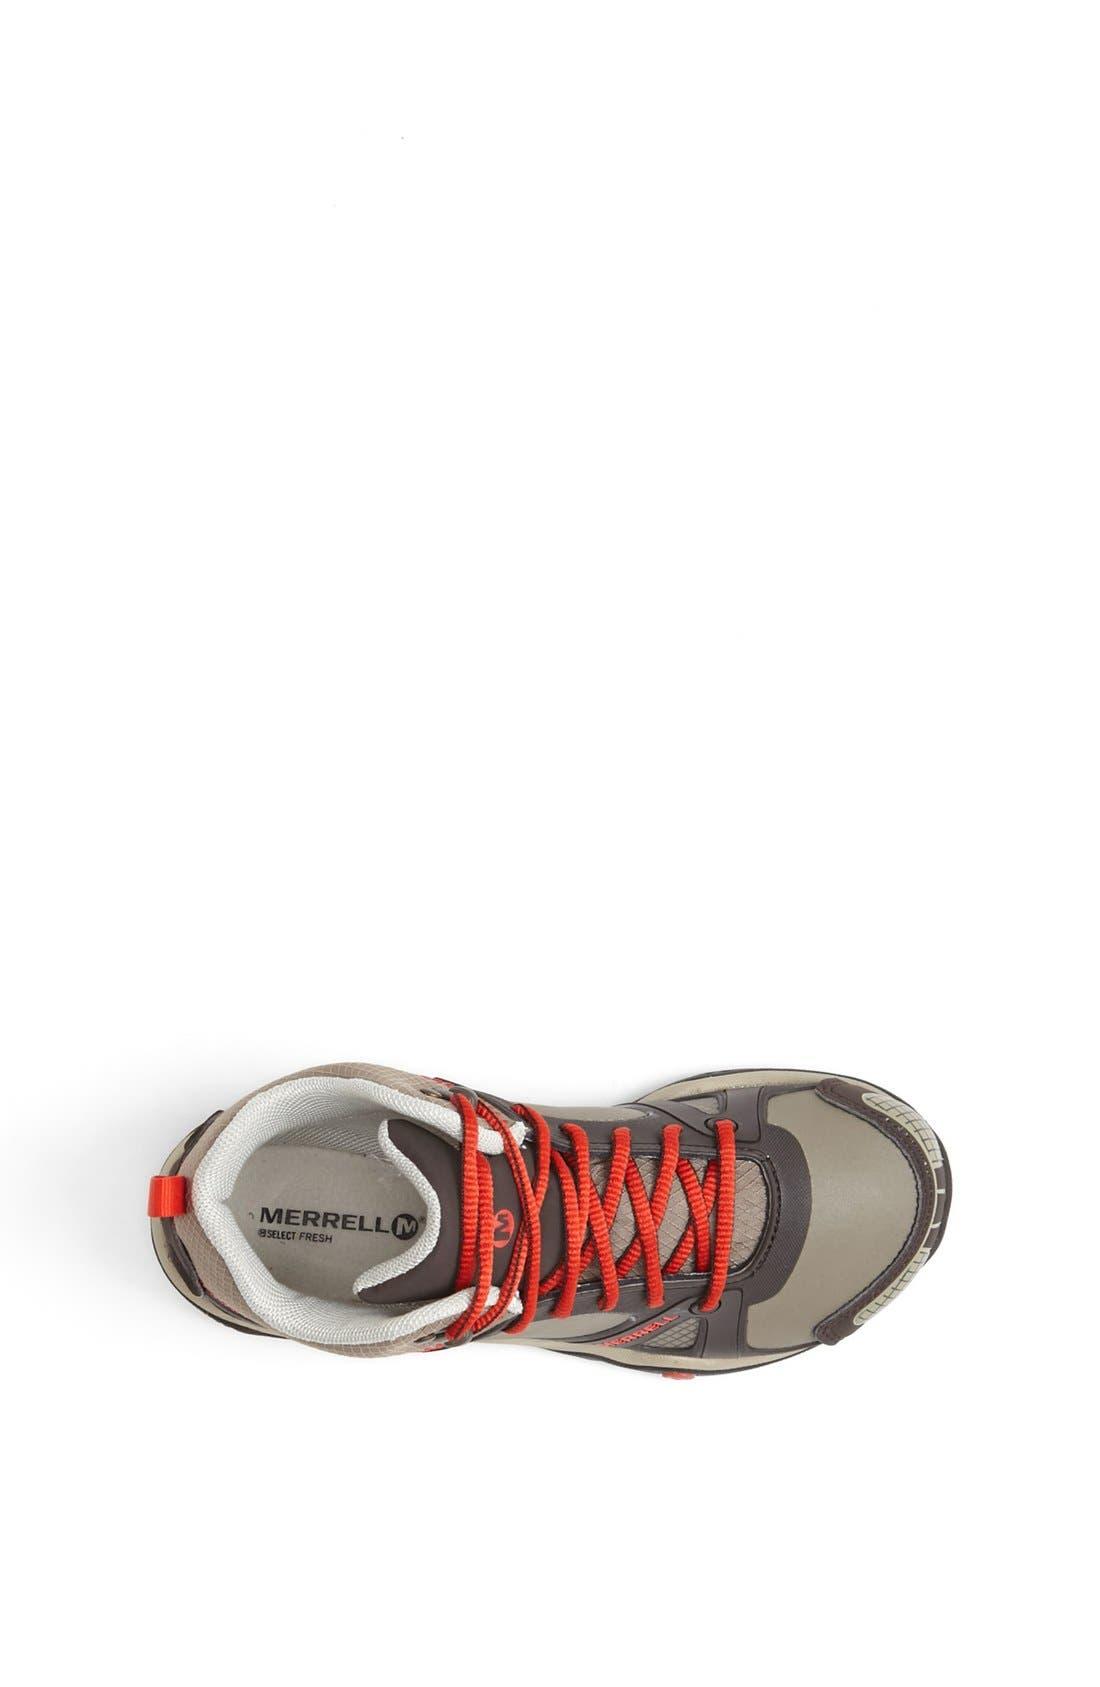 MERRELL,                             'Proterra' Mid High Waterproof Sneaker,                             Alternate thumbnail 3, color,                             201